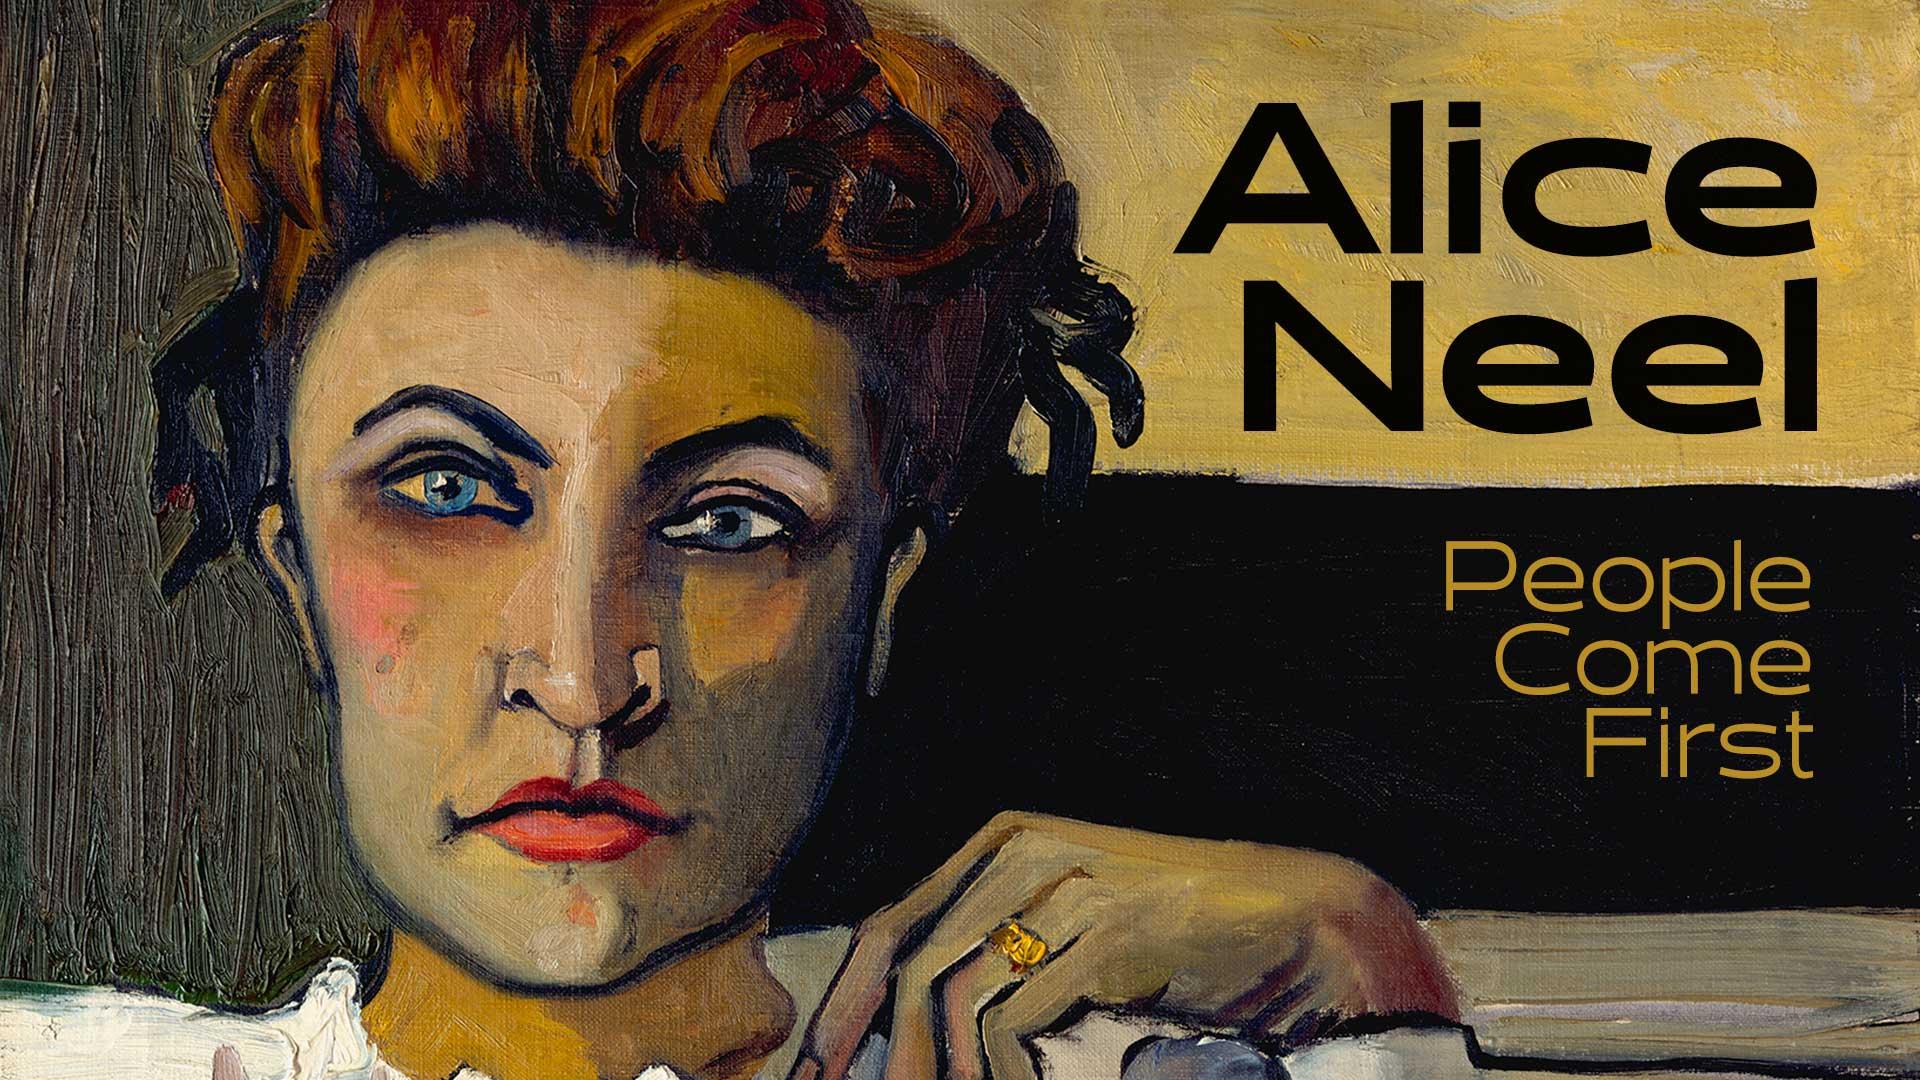 Alice Neel